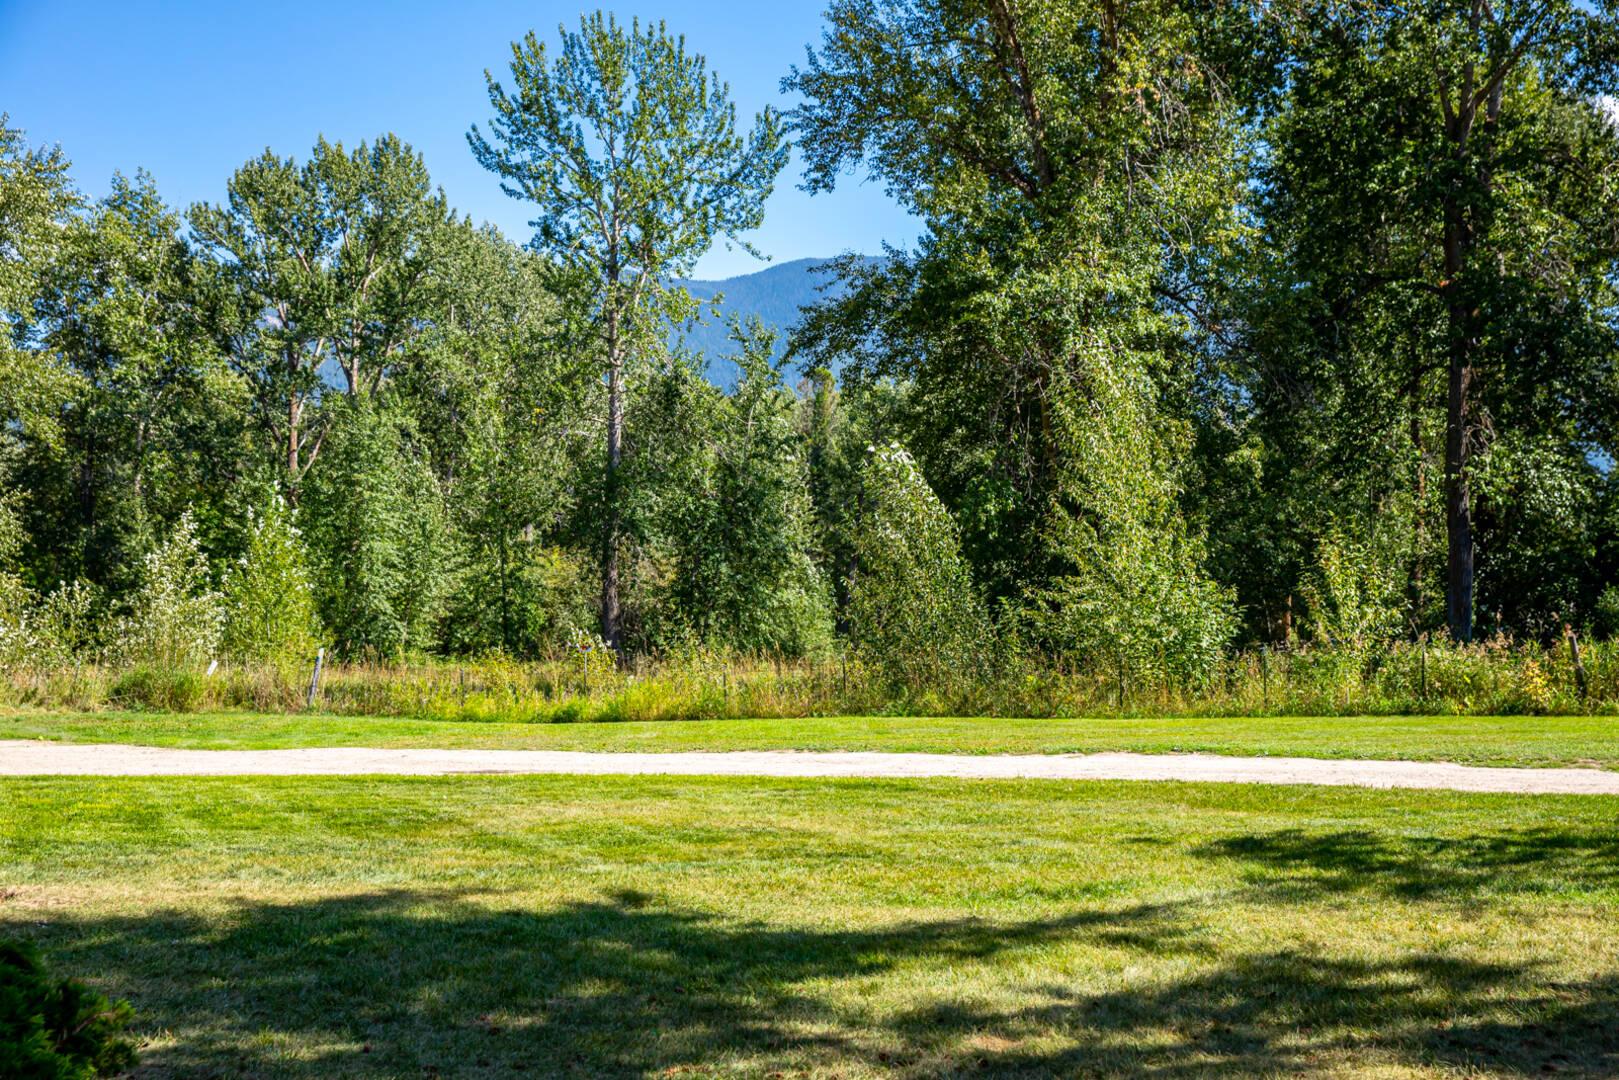 403 4th Ave East Columbia Falls, MT 59912